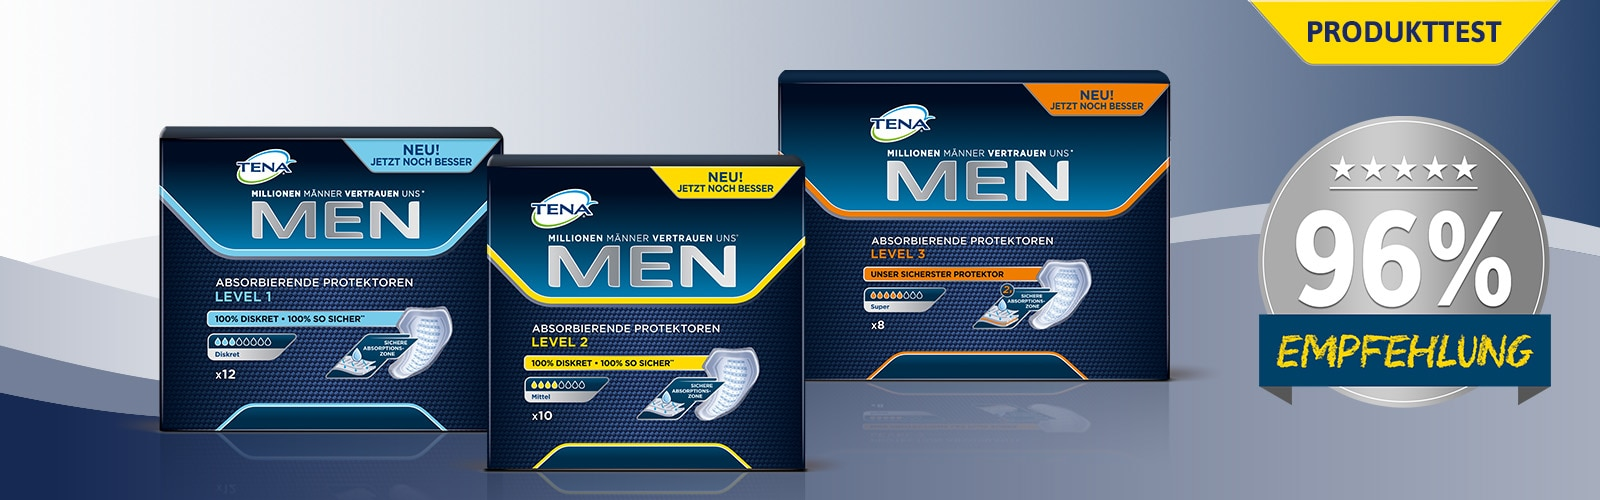 TENA MEN Produkttest